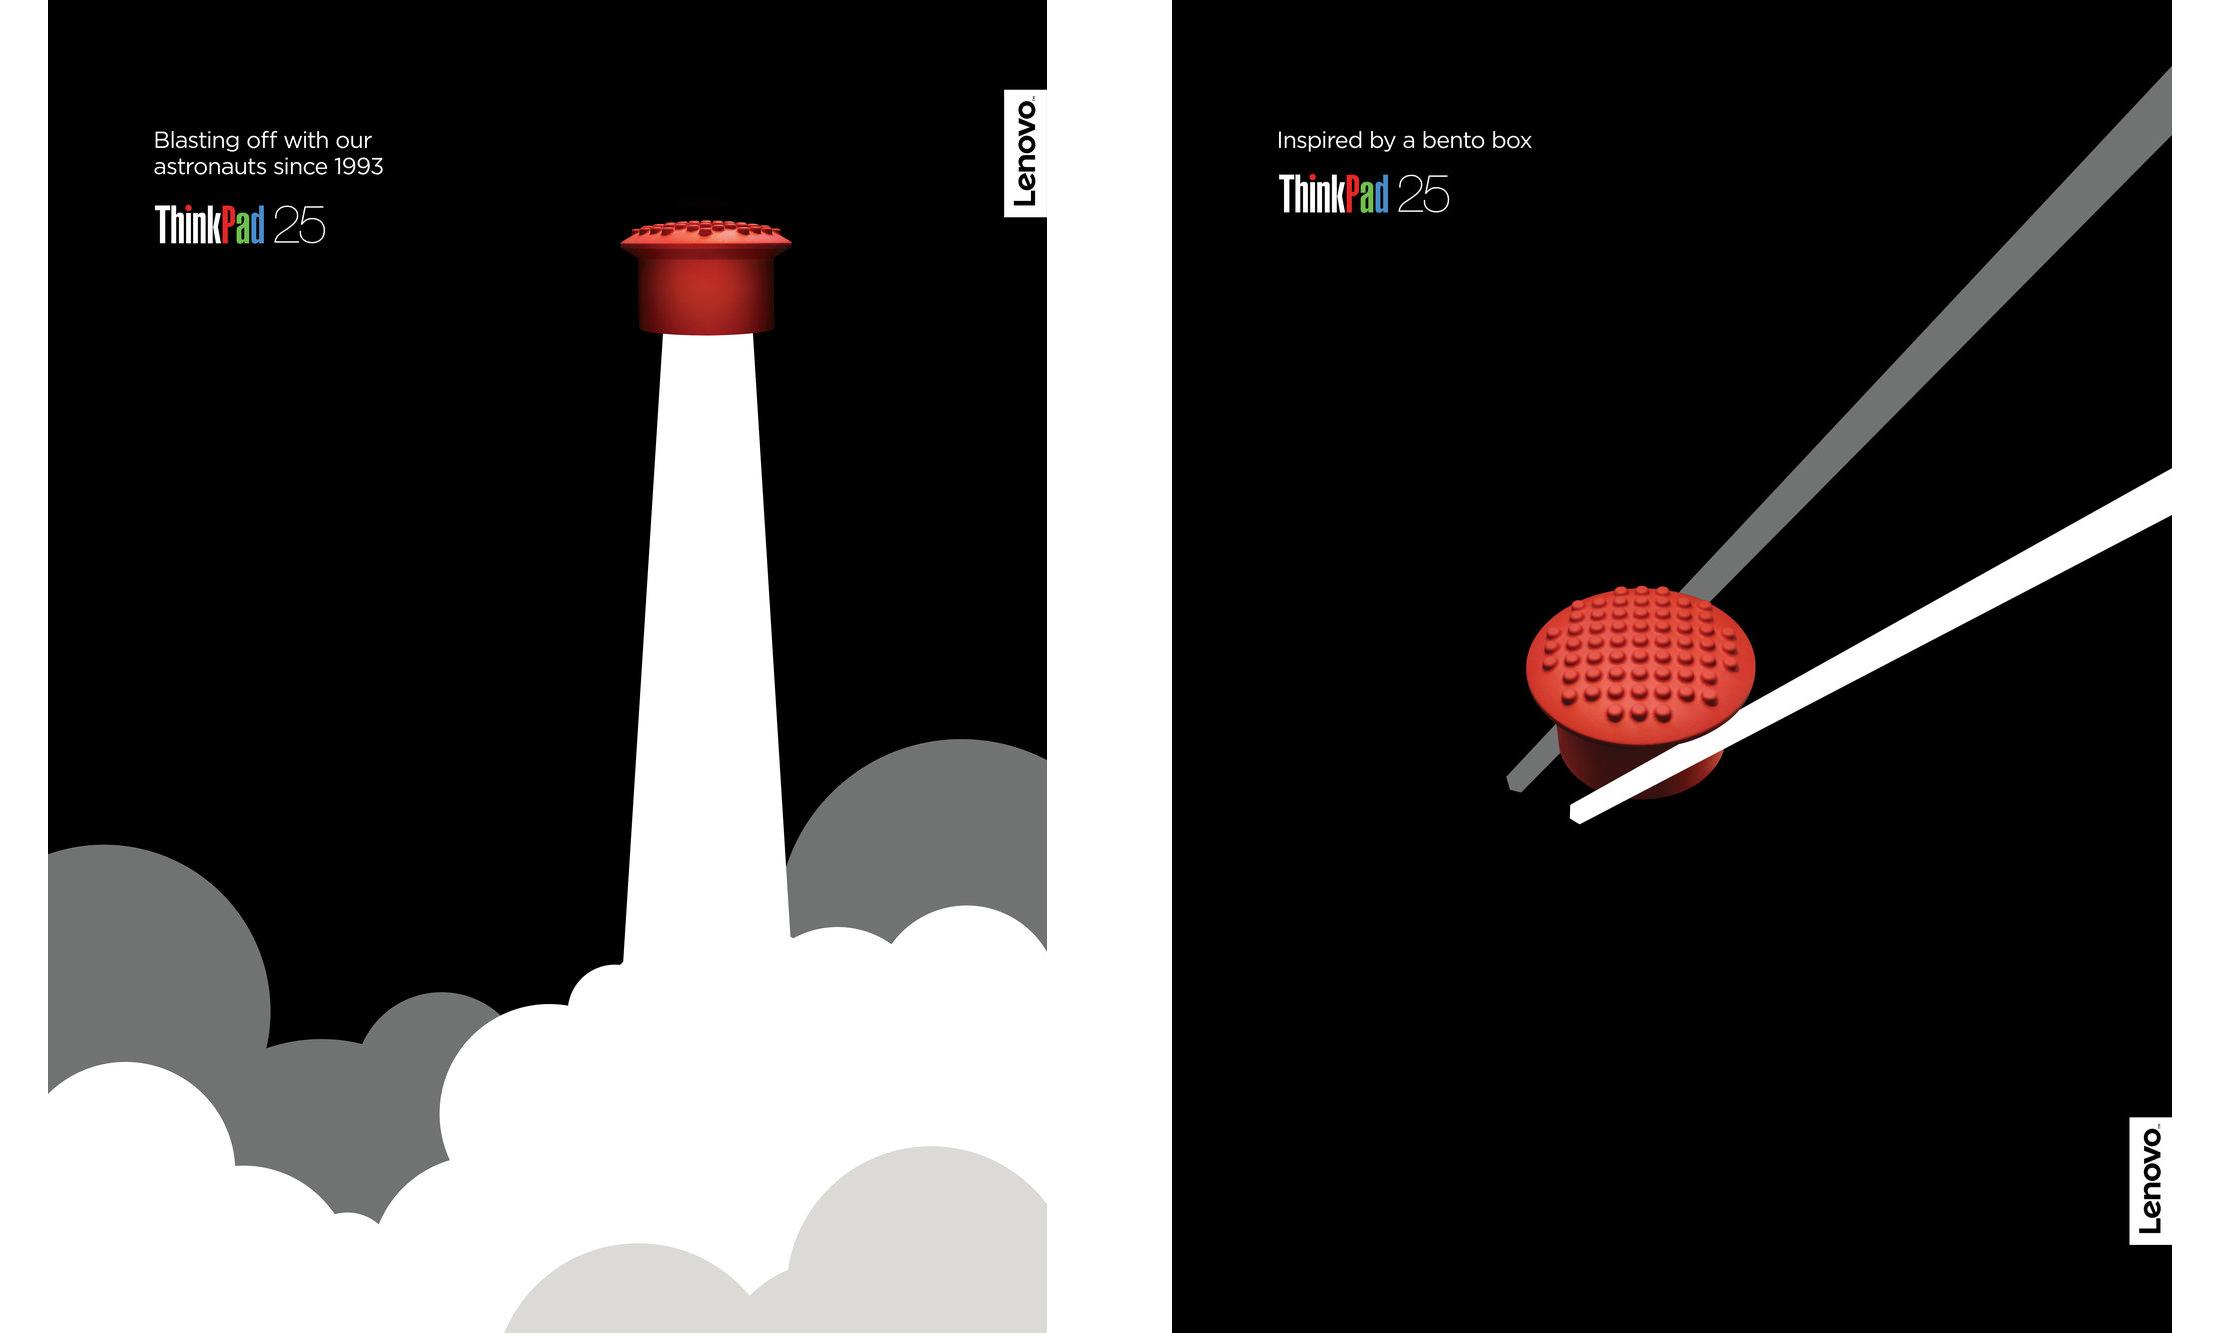 ThinkPad25_Rocket_Bento.jpg